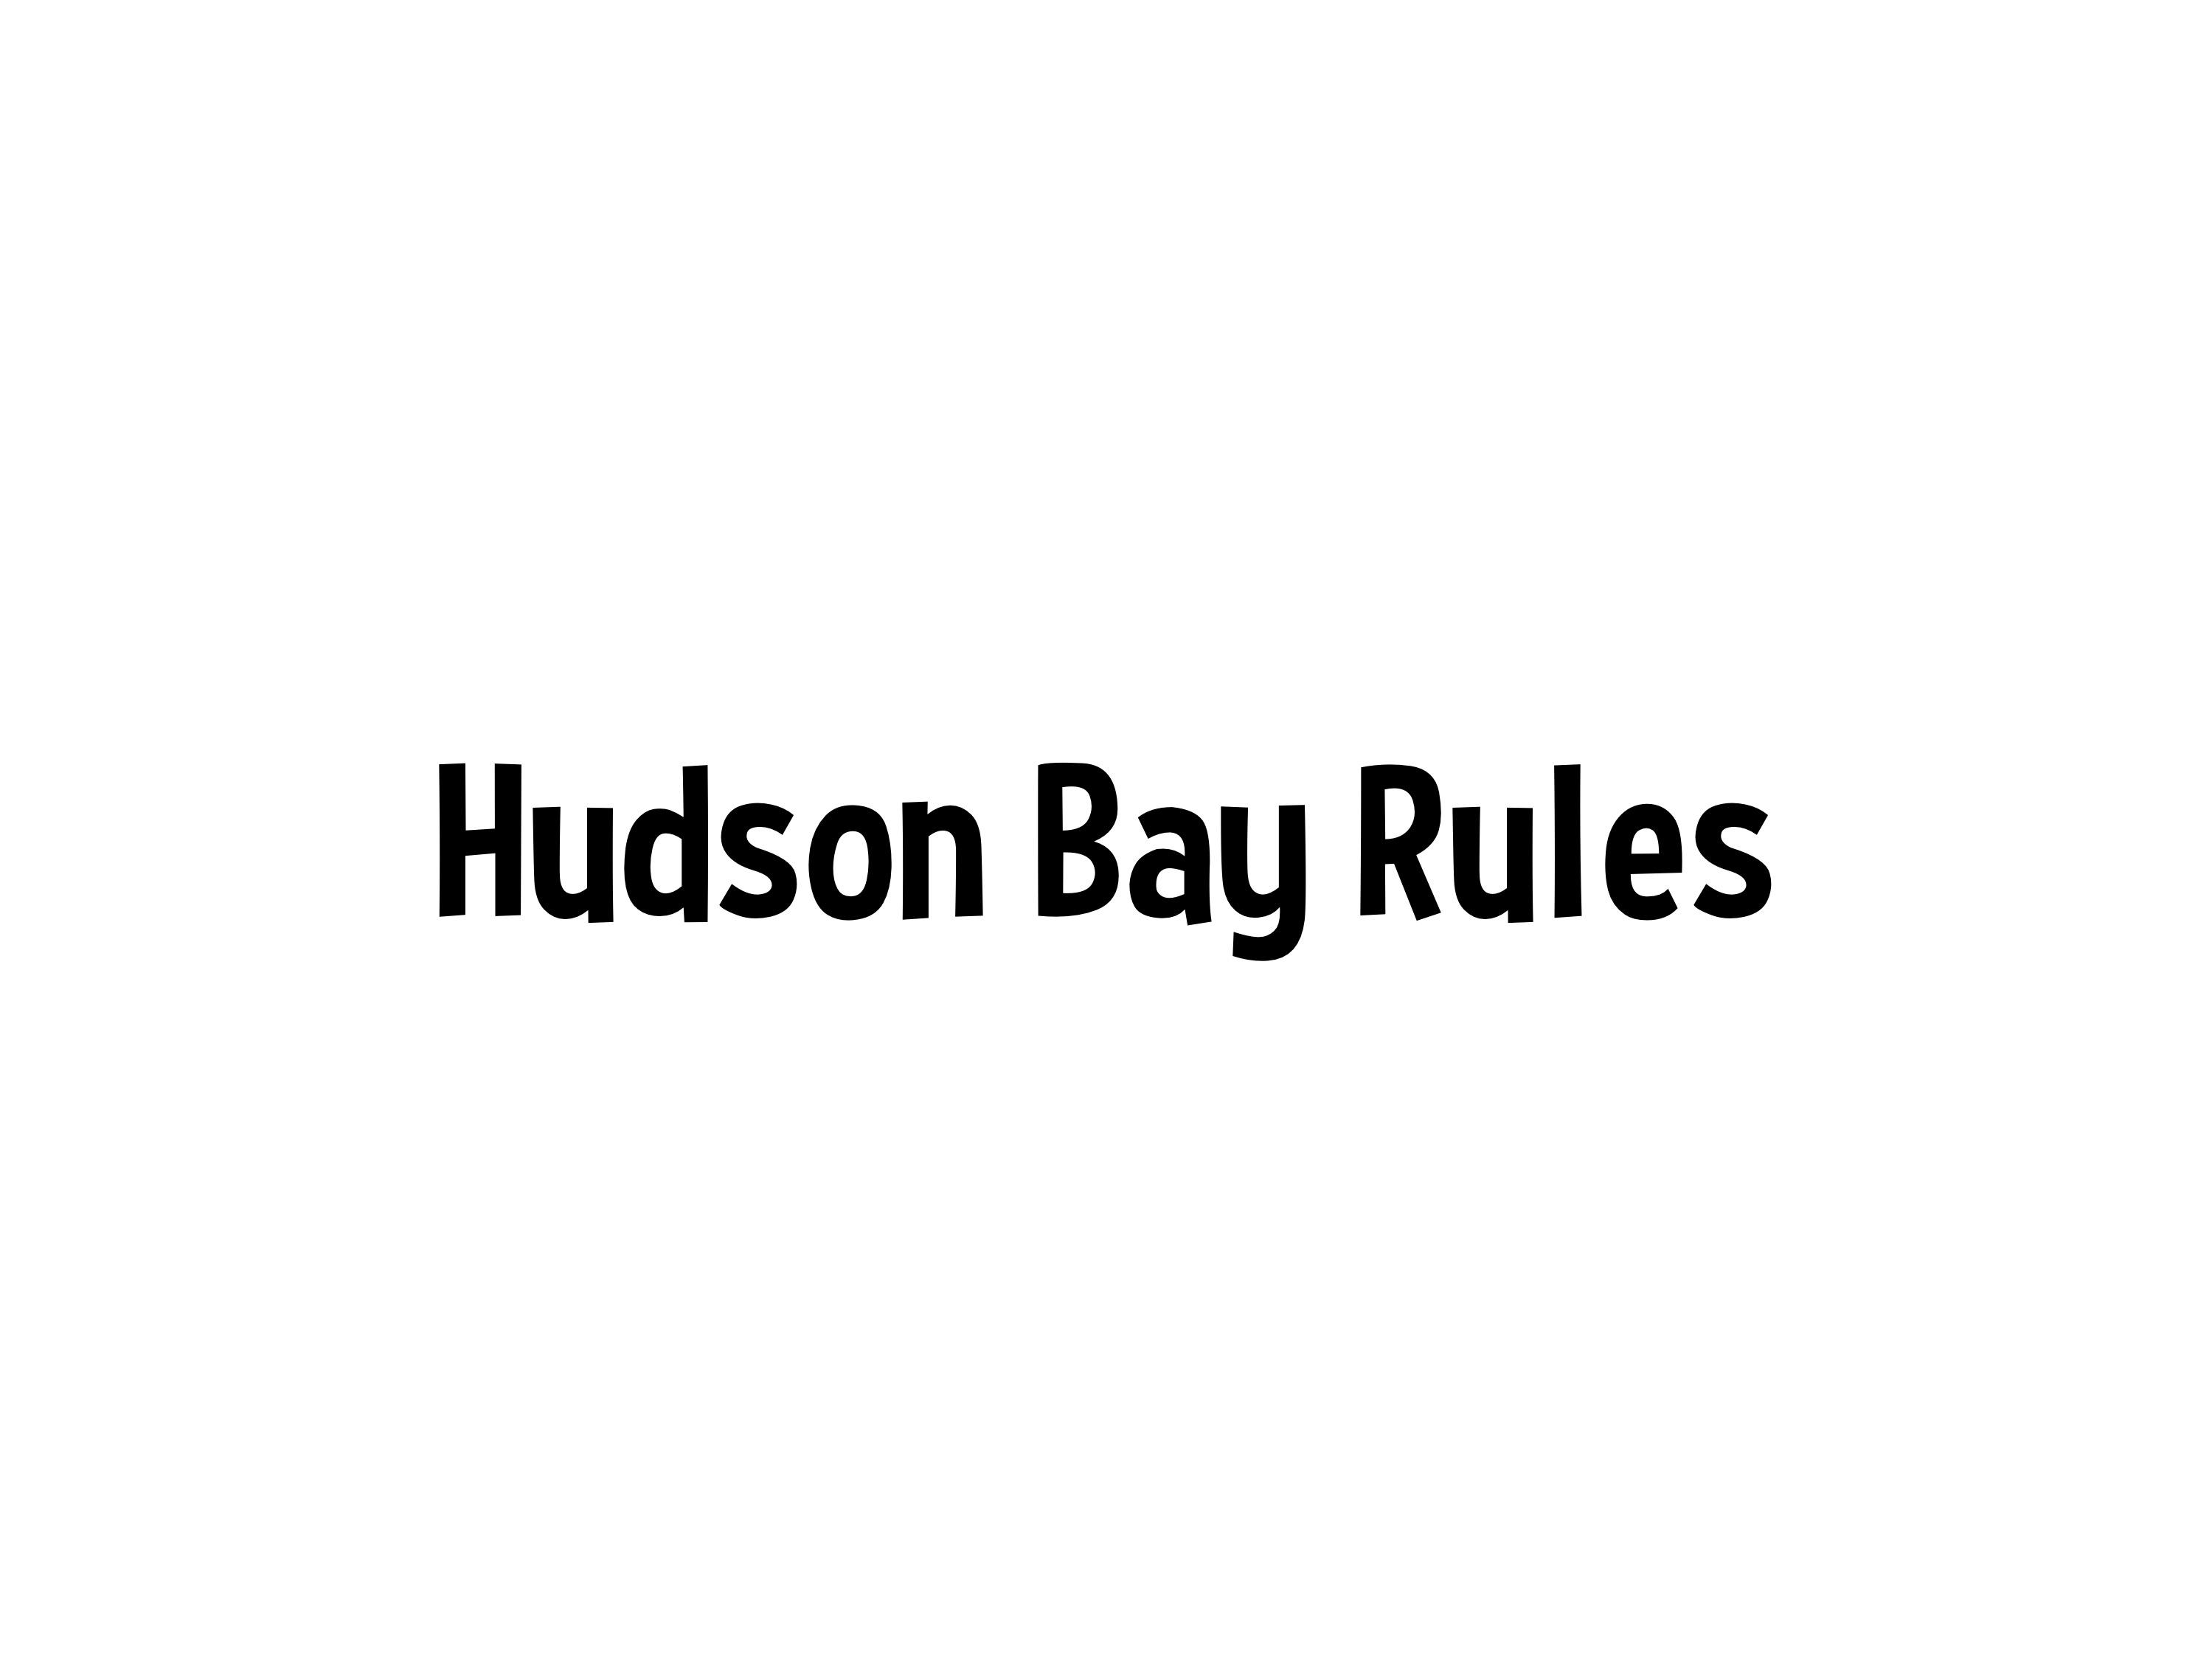 Hudson Bay Rules - Planeta.com